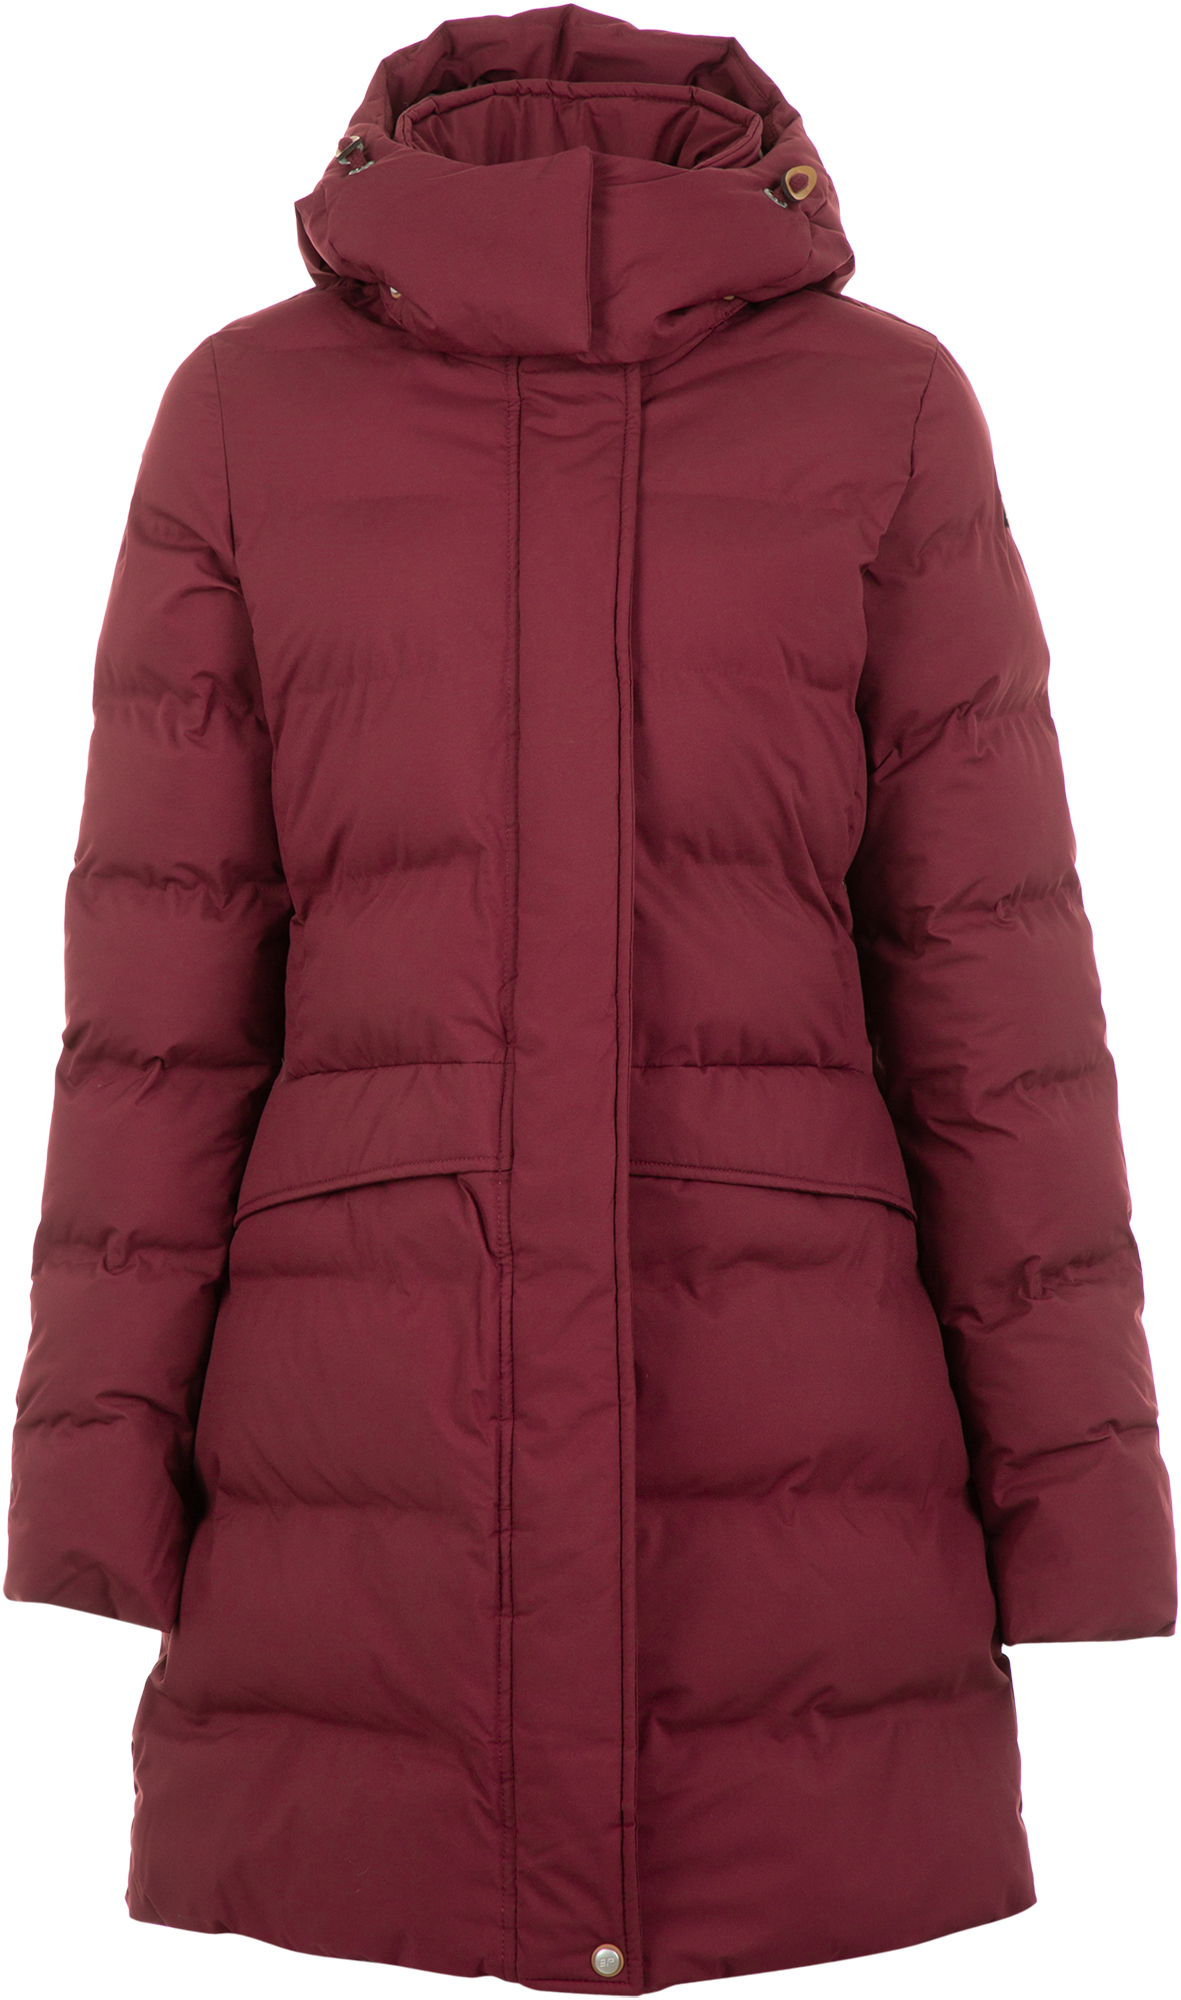 IcePeak Куртка утепленная женская IcePeak Anoka, размер 50 цены онлайн